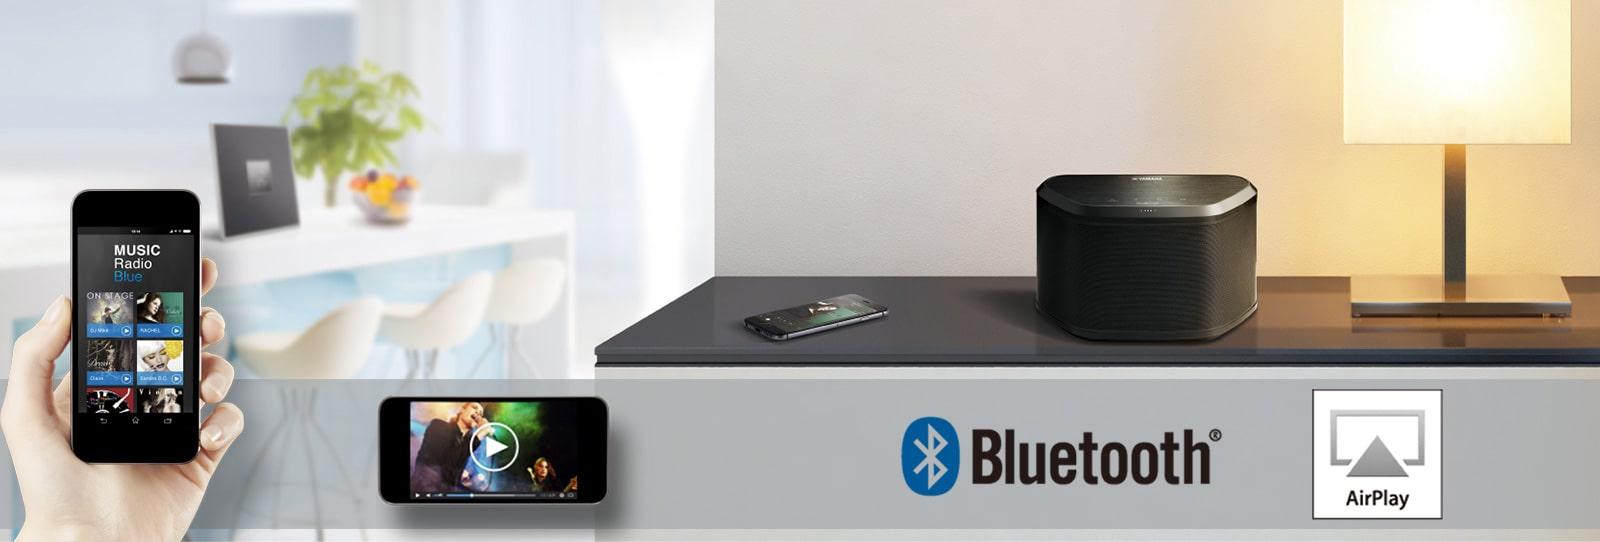 Yamaha MusicCast : Bluetooth & AirPlay